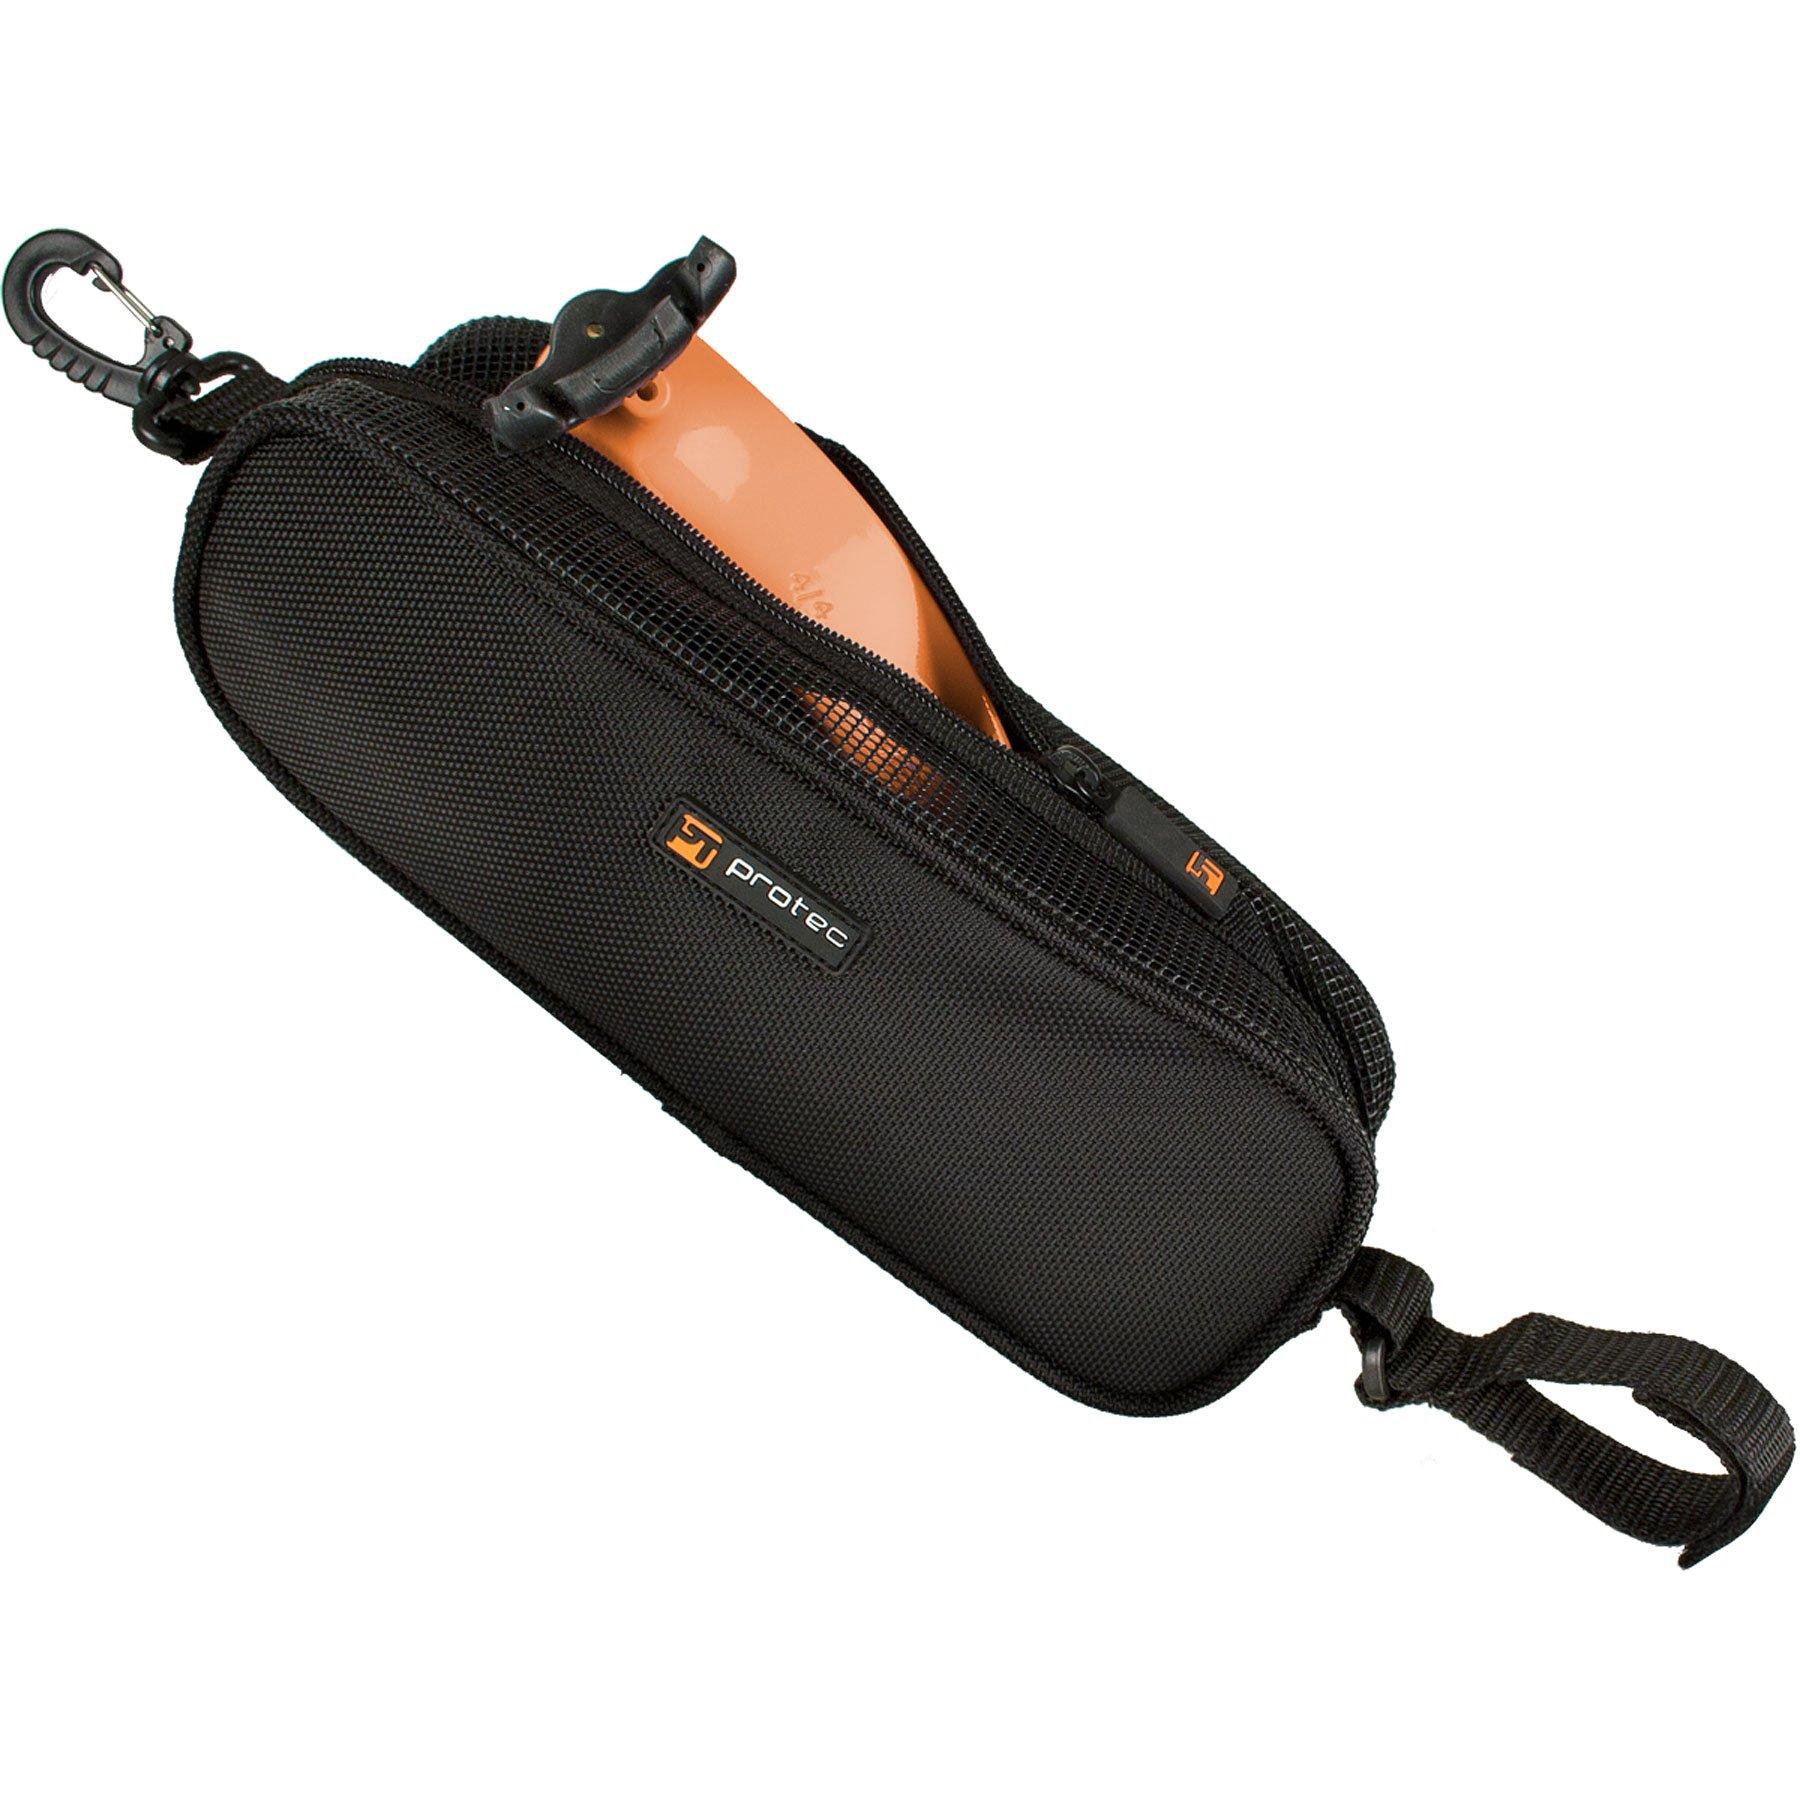 Protec A223 Violin/Viola Shoulder Rest Pouch